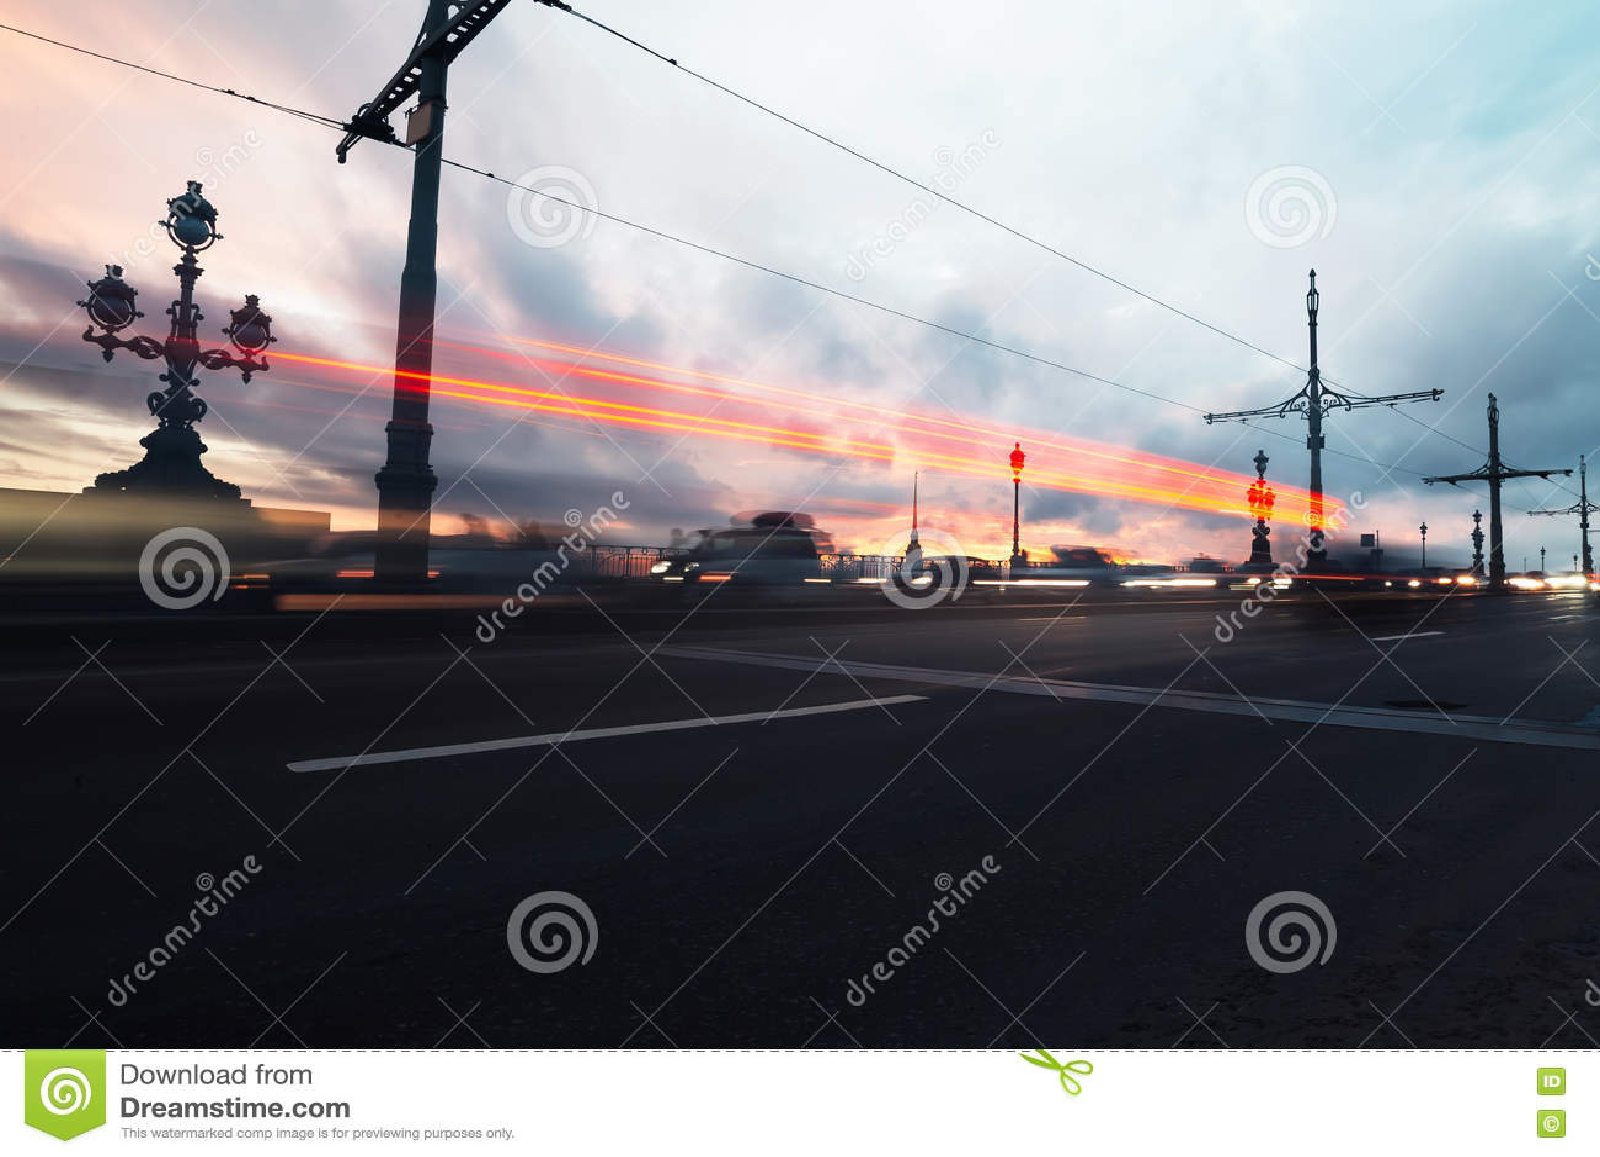 City road motion blur. Night background